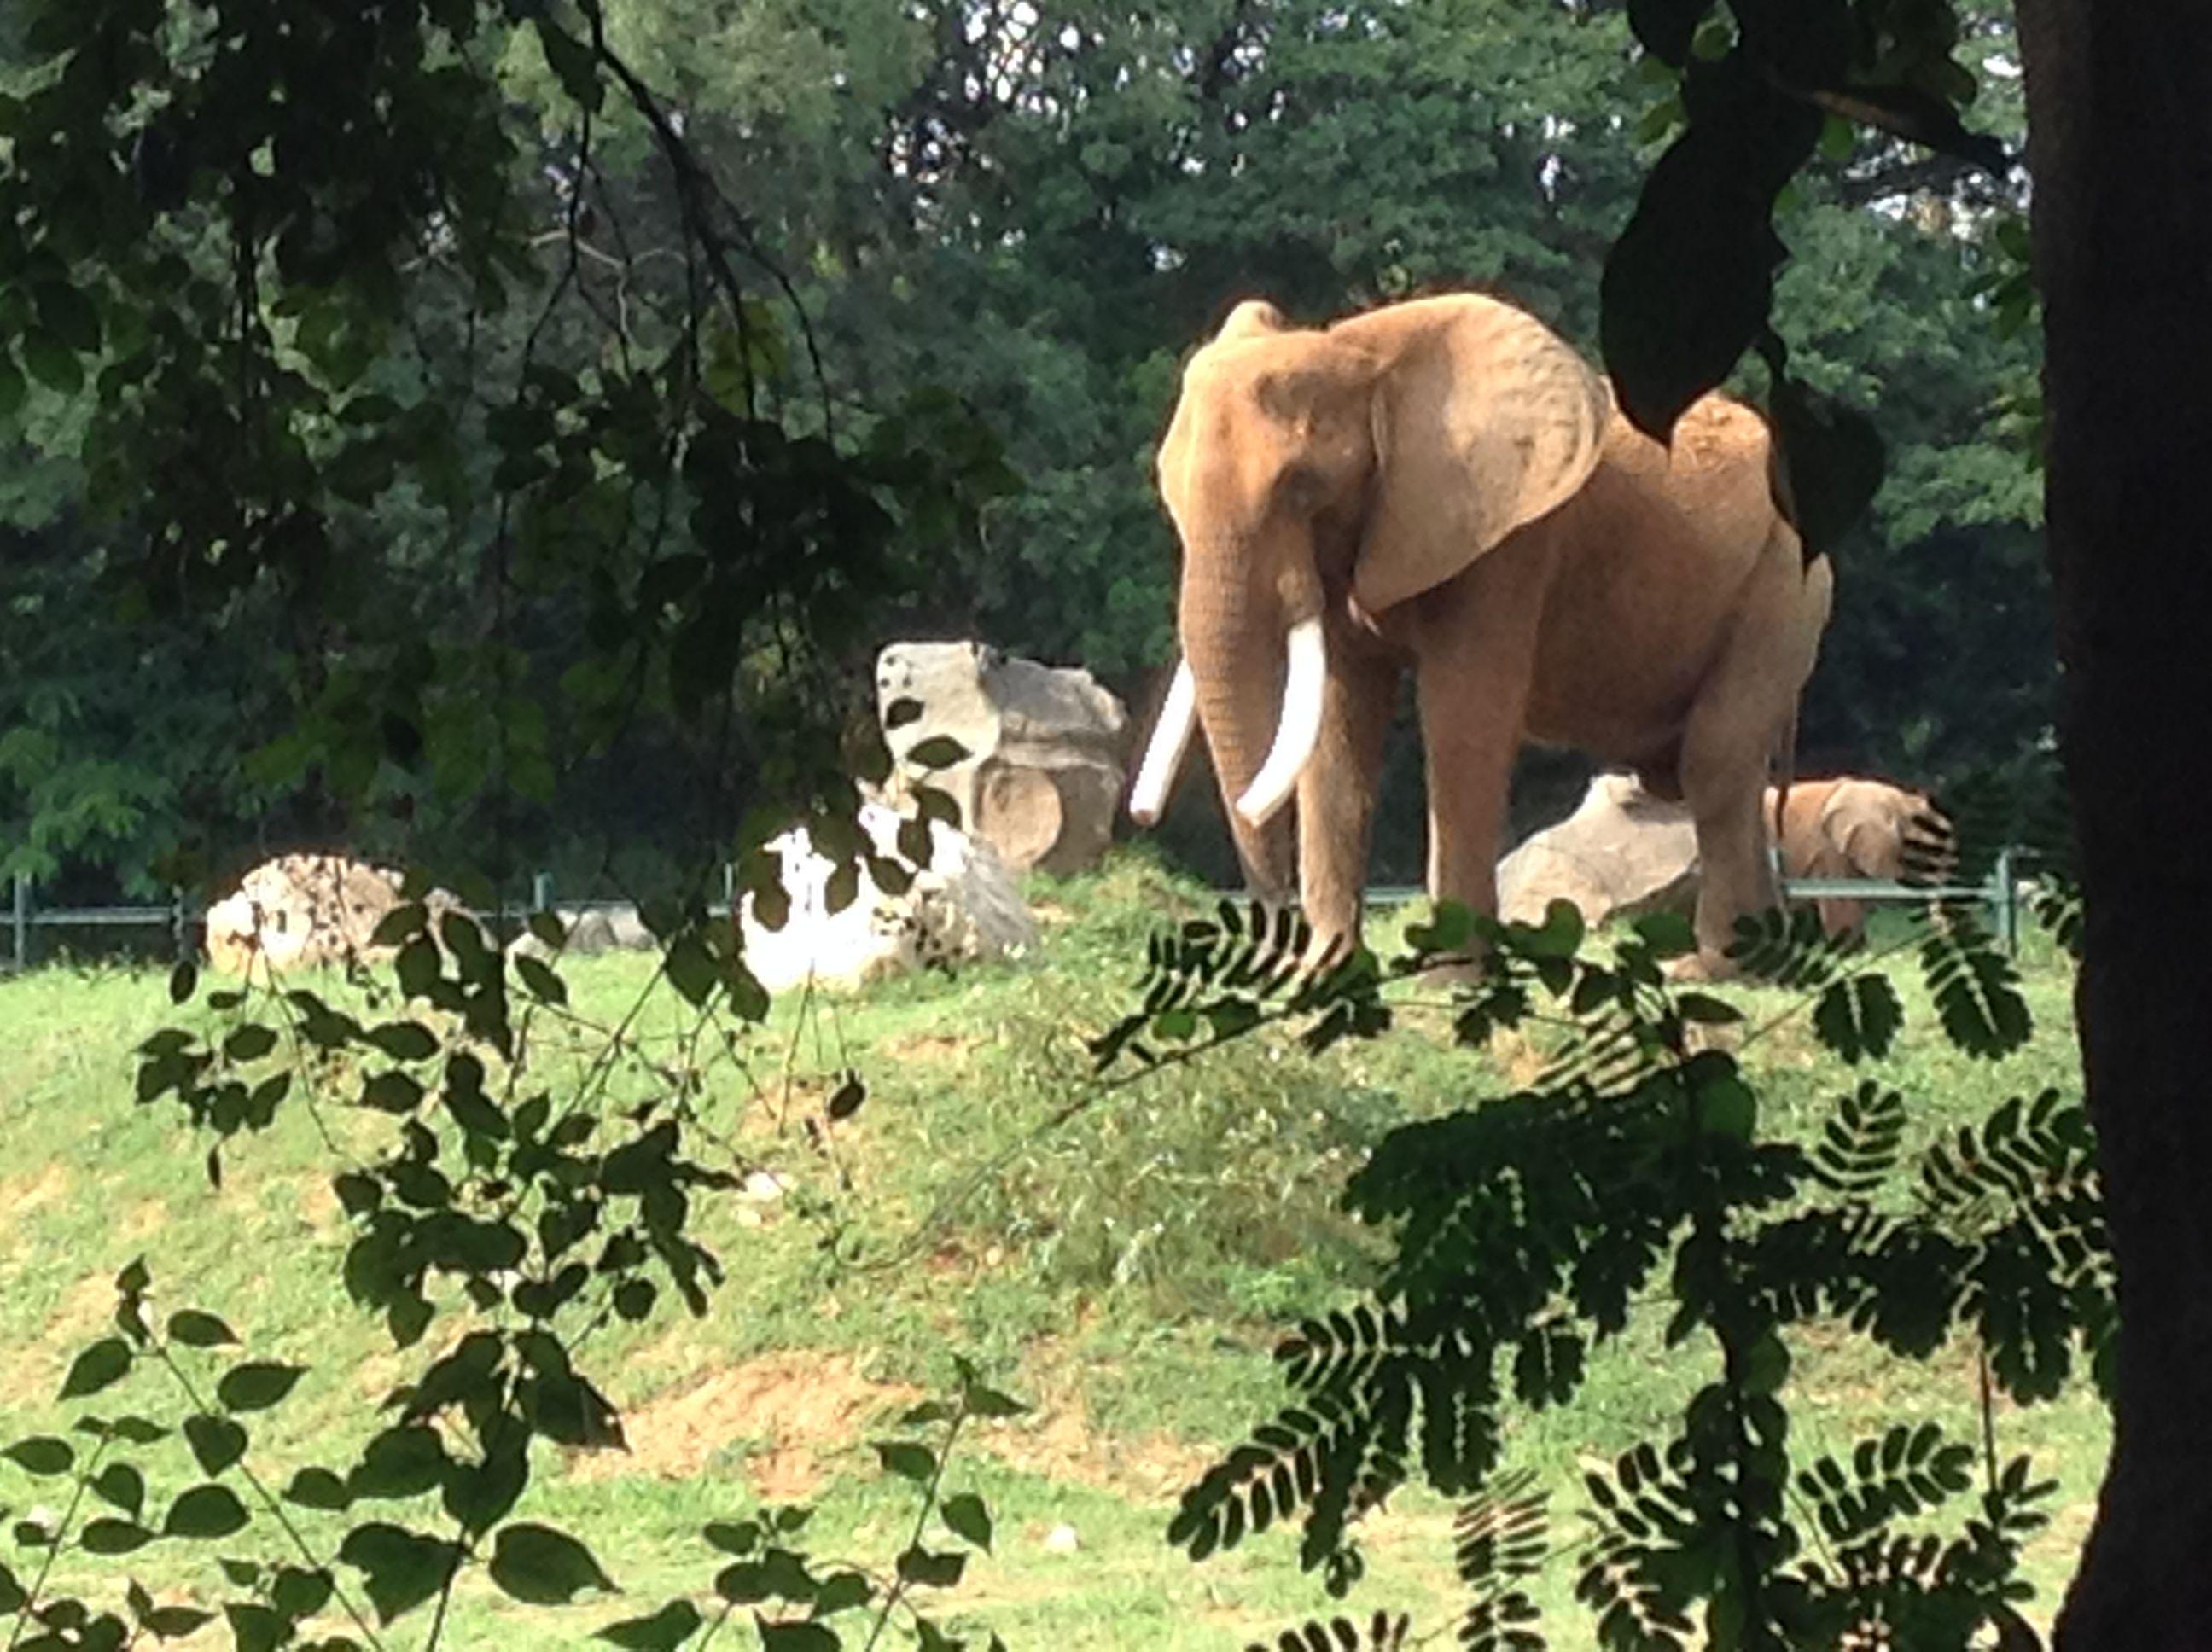 018436656e0e411a70f84fd23a946e04 - Mysore Zoo Sri Chamarajendra Zoological Gardens